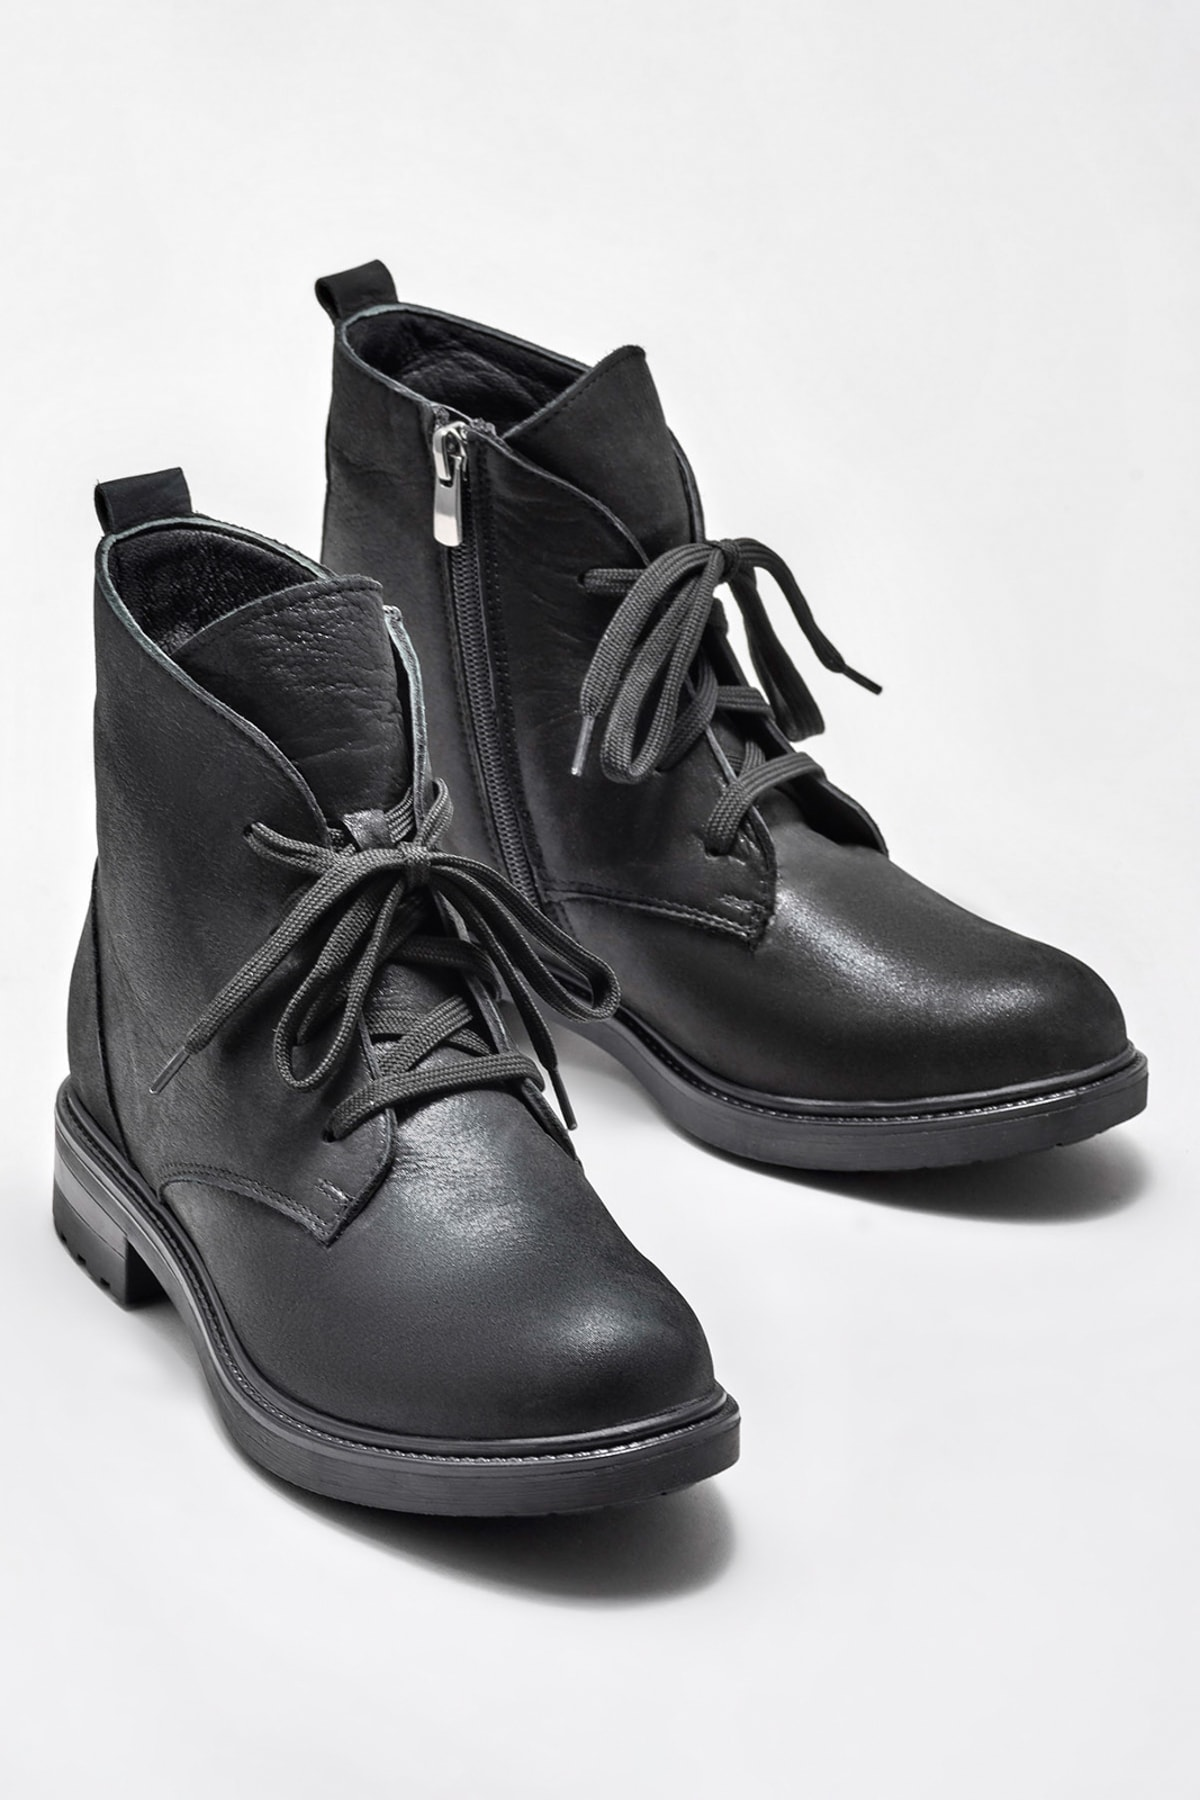 Elle Shoes MARITZA Hakiki Deri Siyah Simli Kadın Bot 2